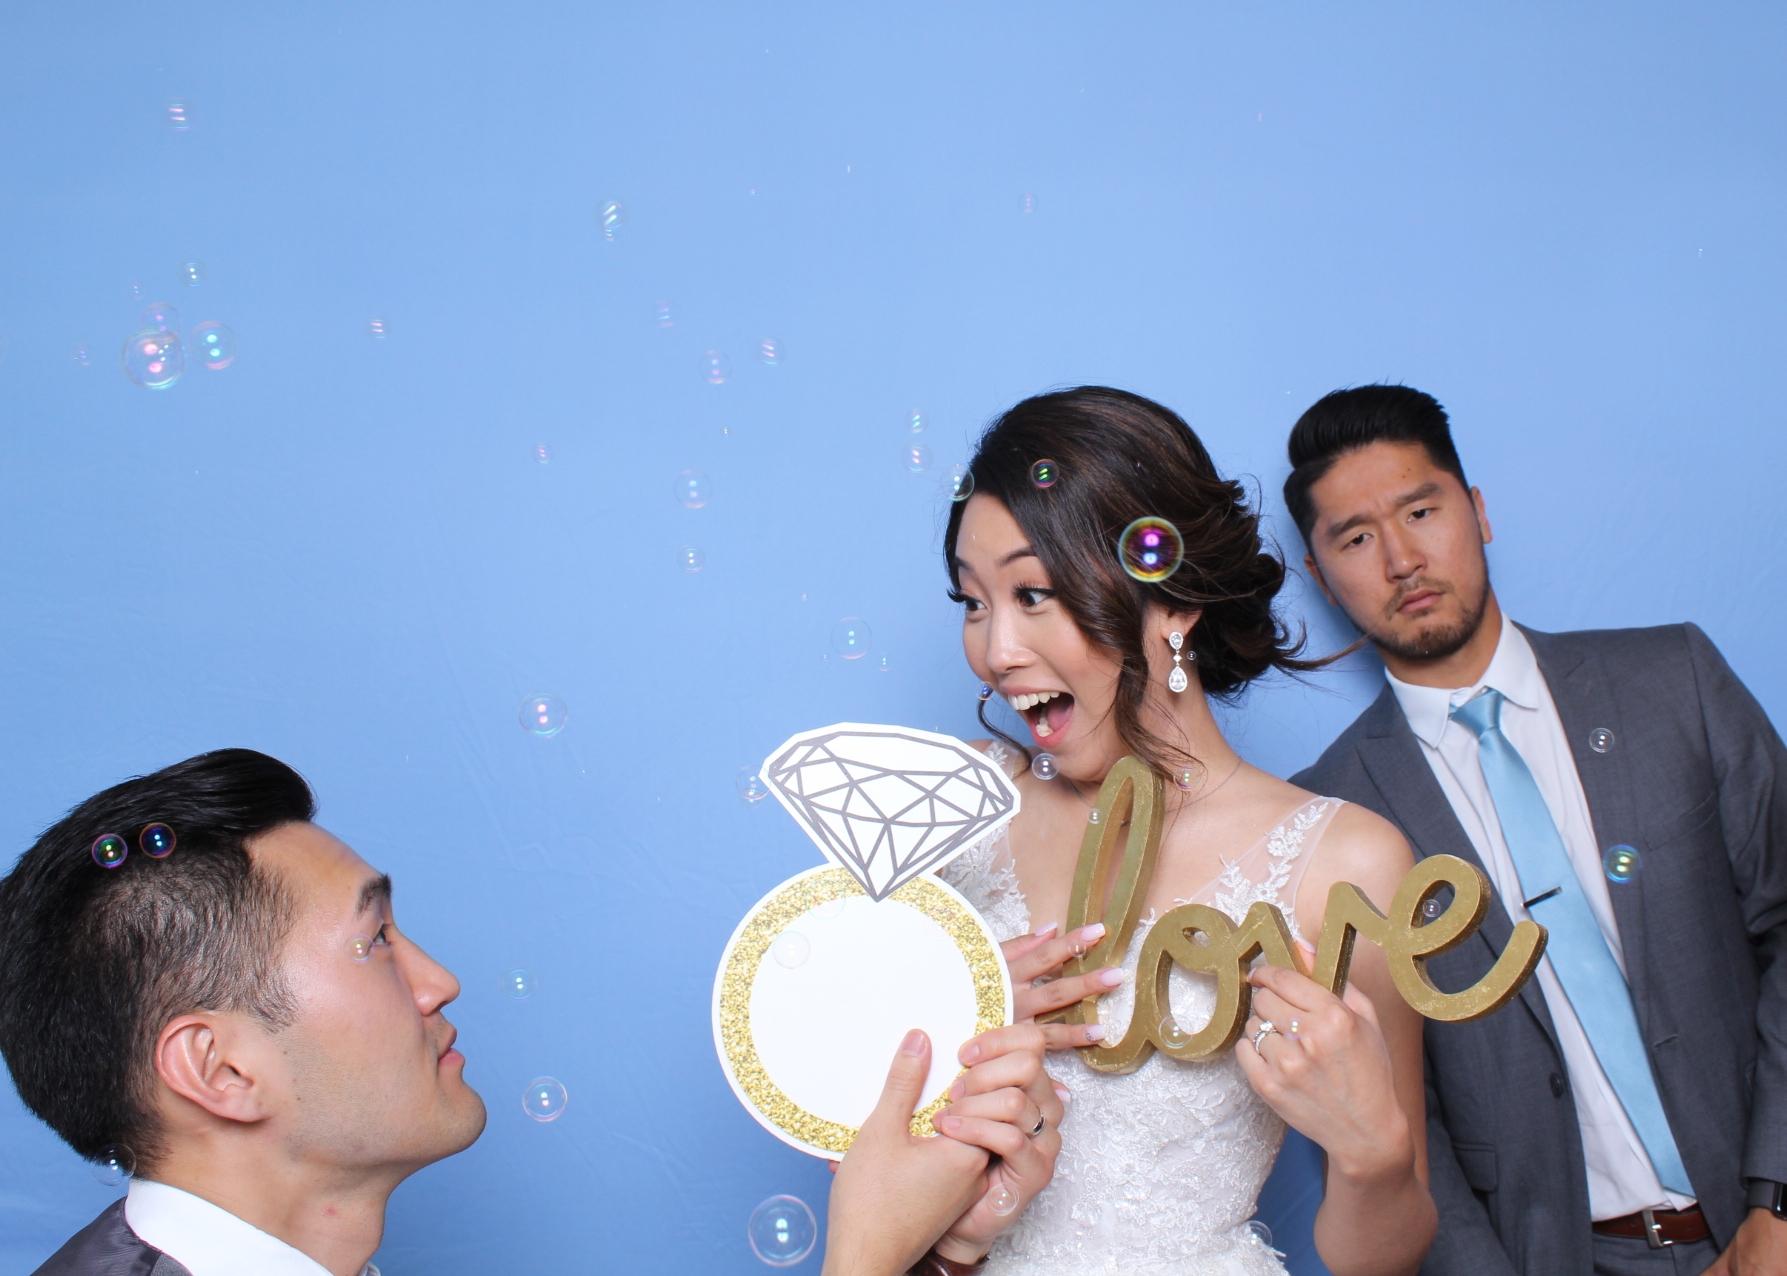 dfw photo booth weddings